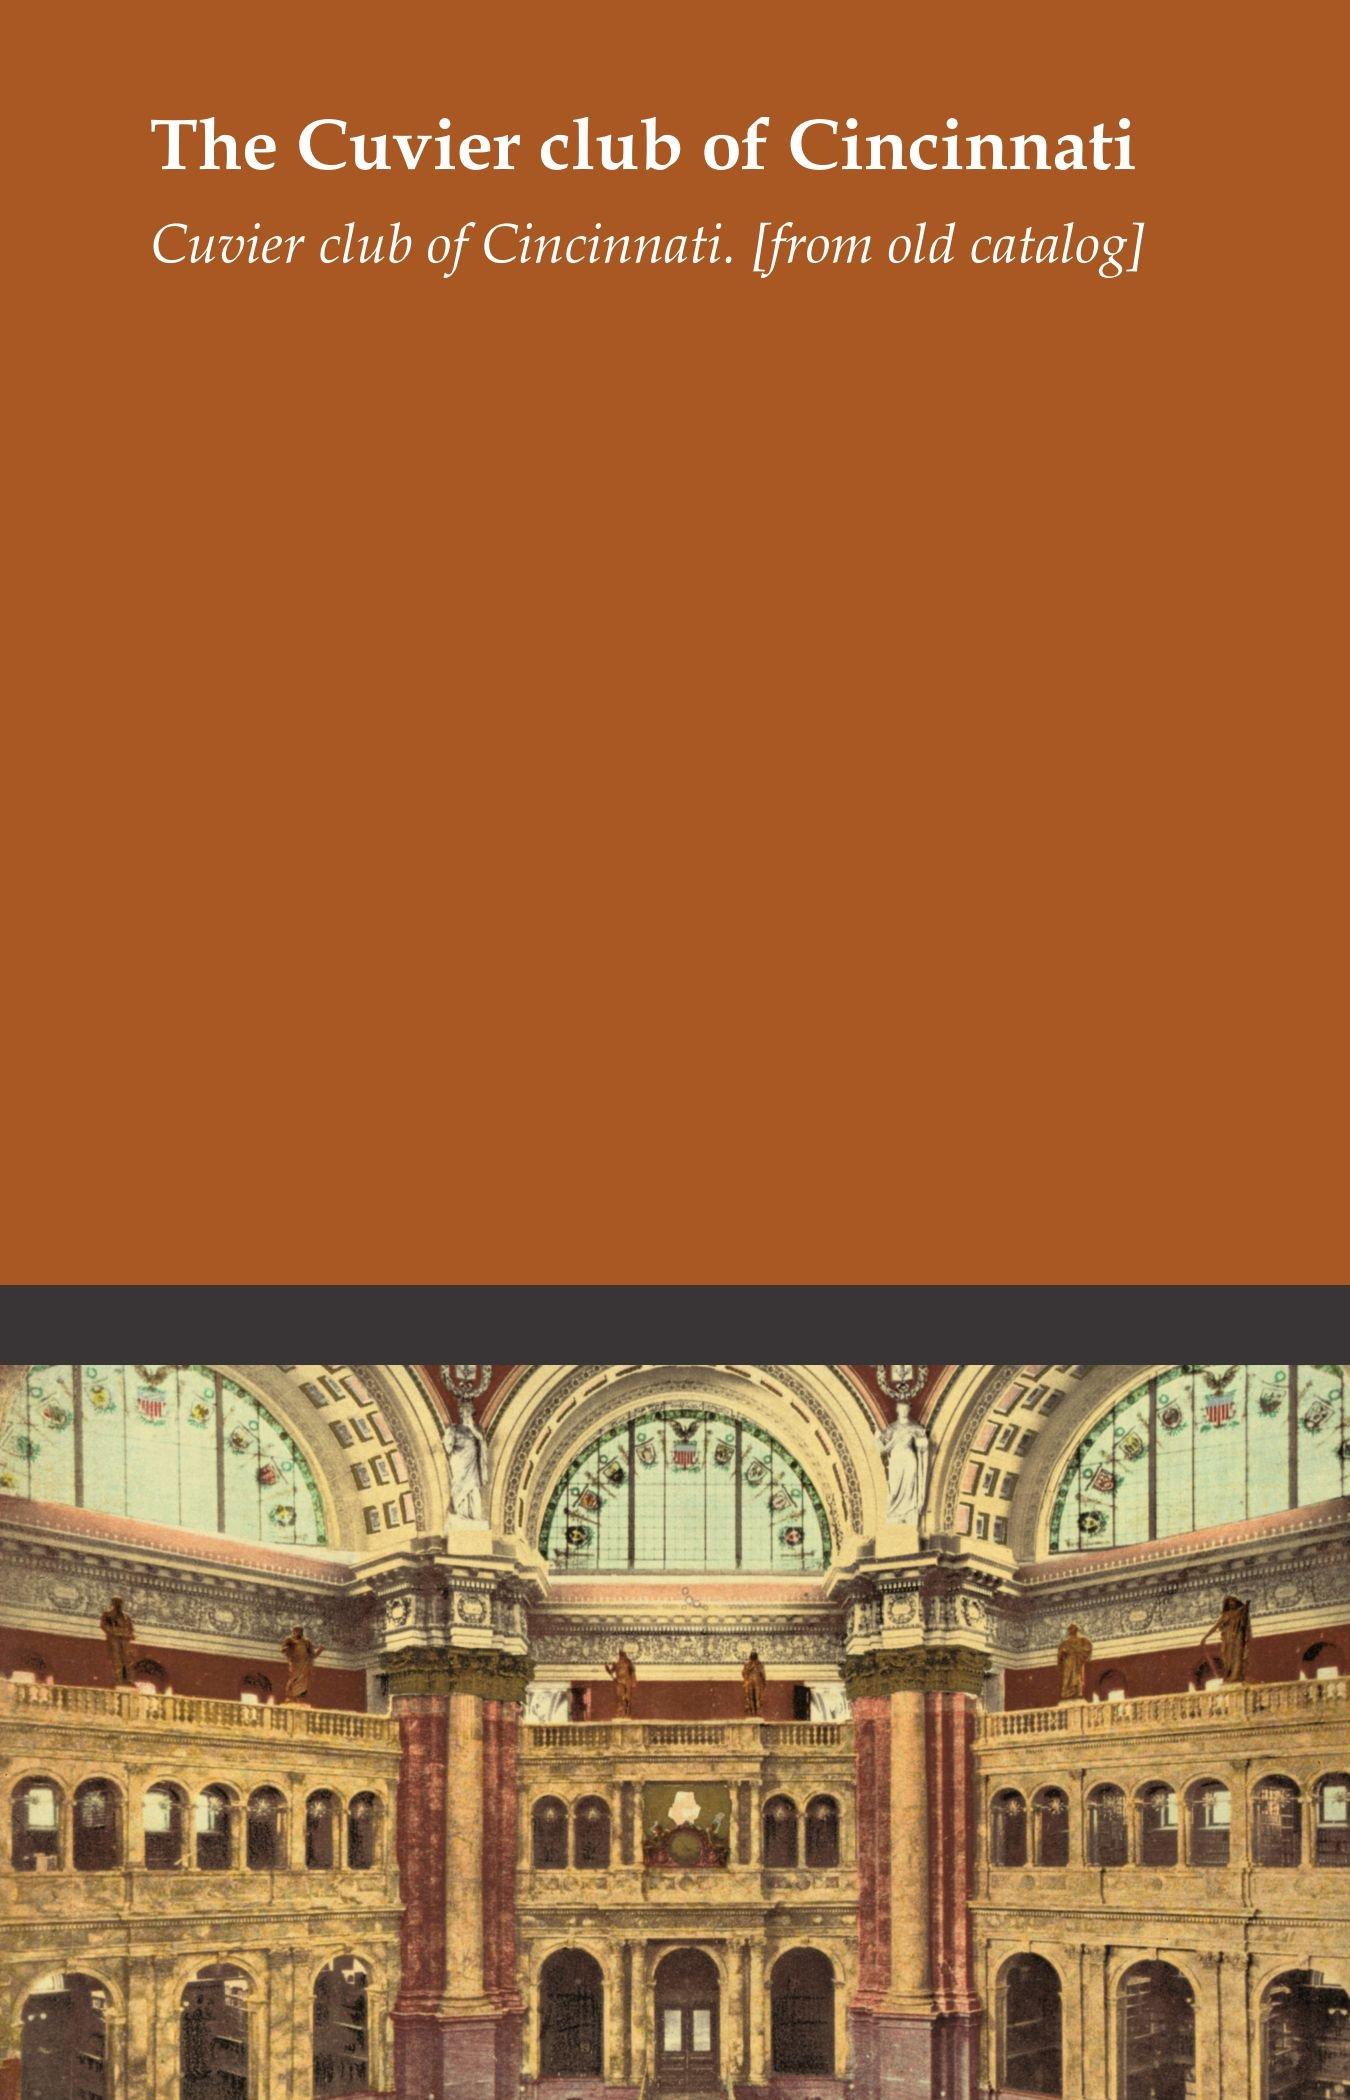 Download Mineur Blues (Piano 3) - Jacques Erdos - Jean Sichler - Combre - Piano - 510-06316 ePub fb2 book